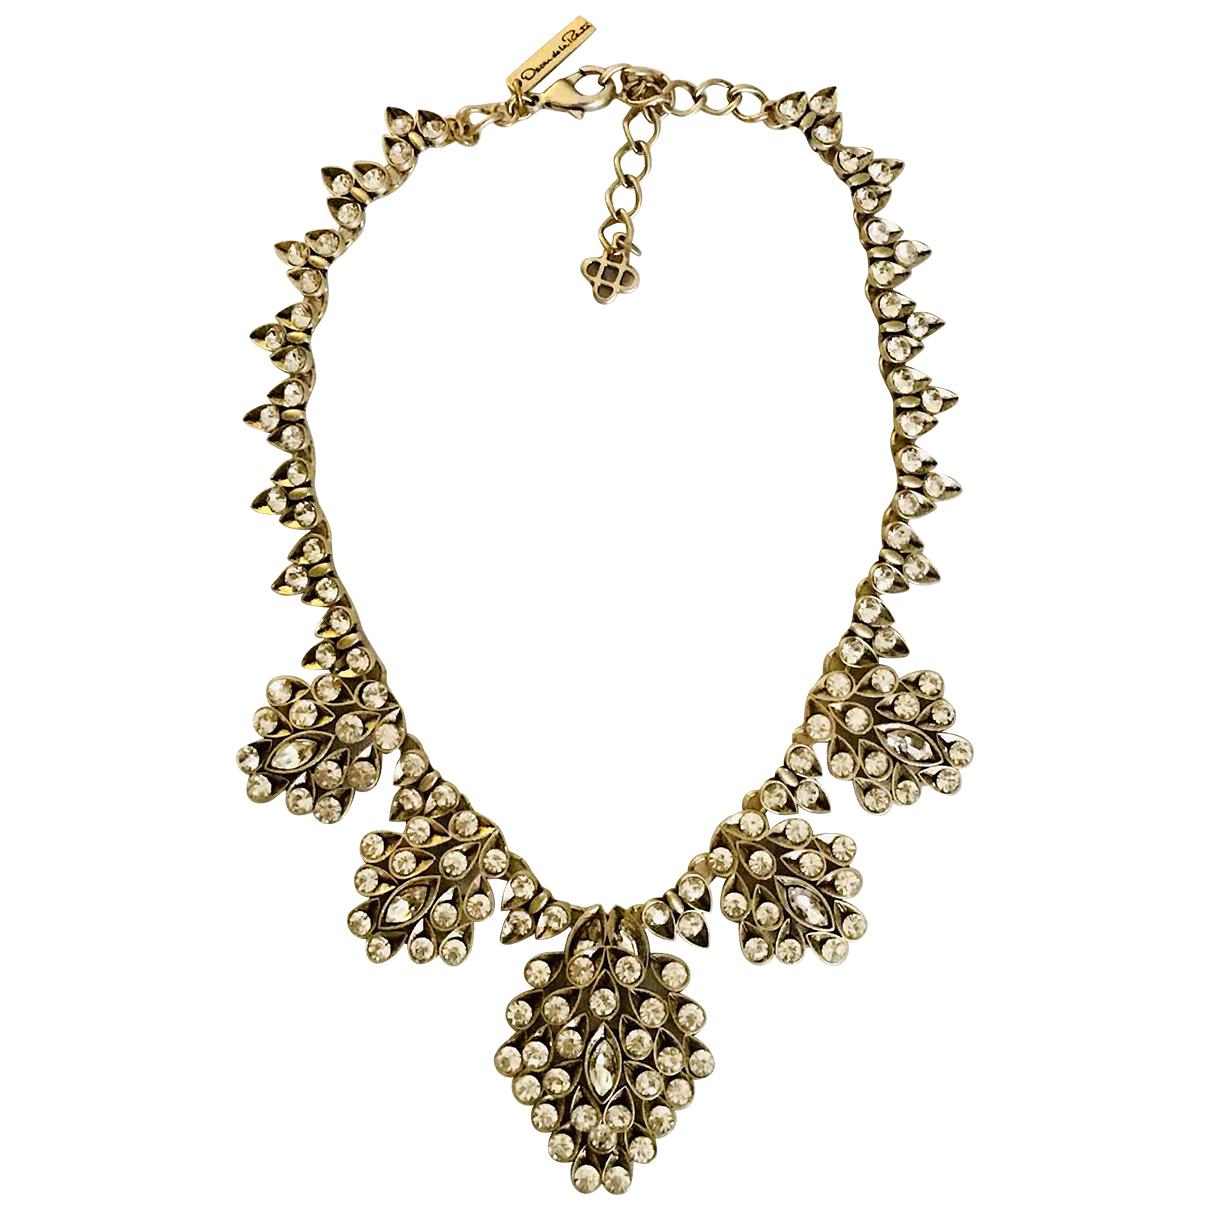 Oscar De La Renta \N White Metal necklace for Women \N